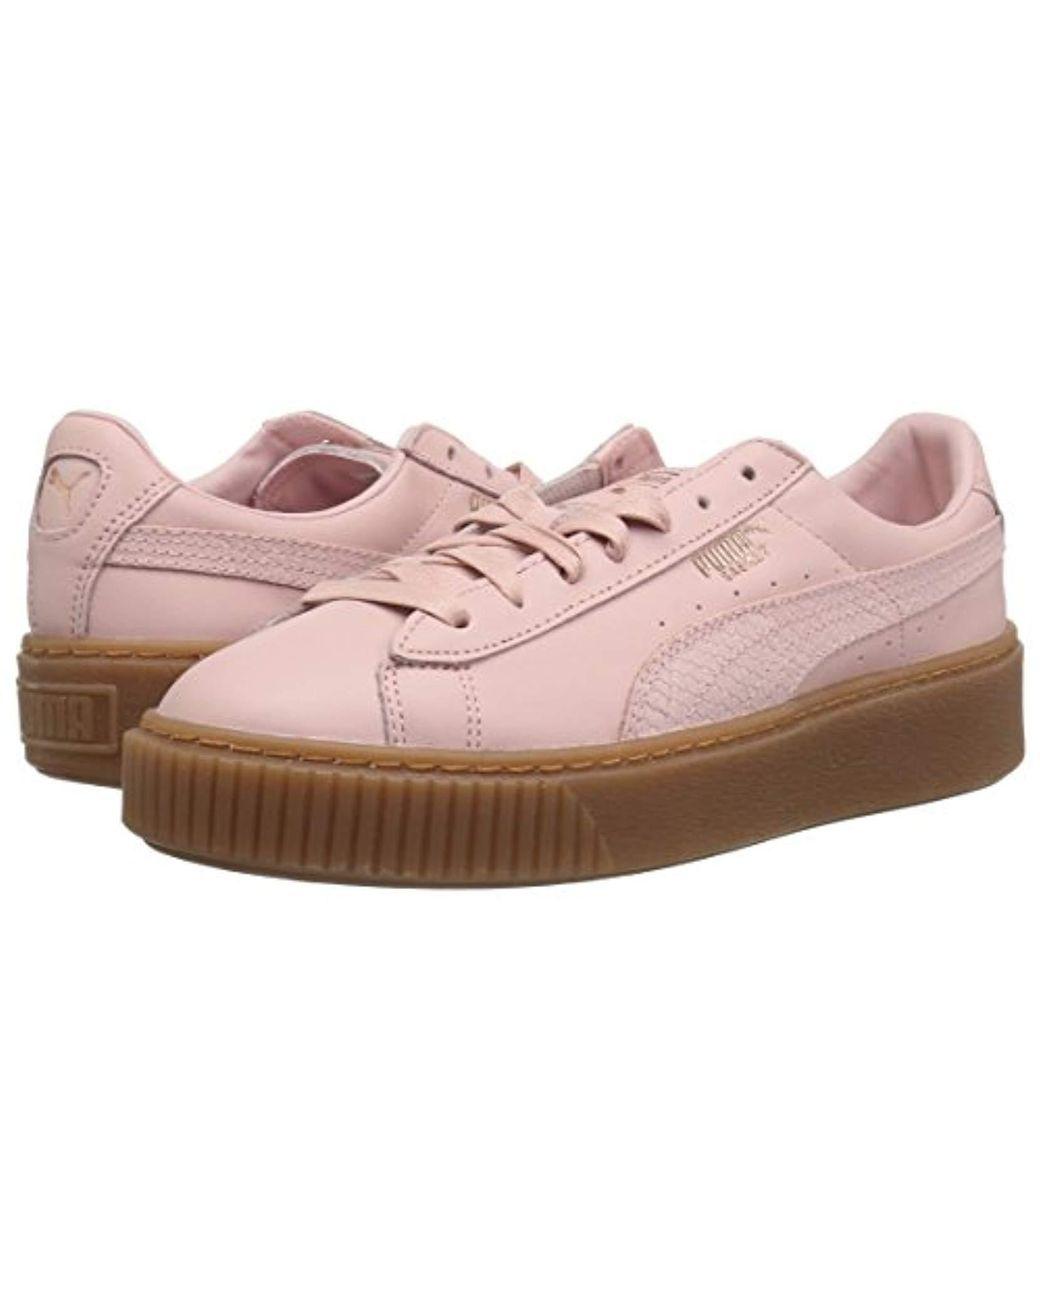 huge discount 4a3d7 4d4cf Women's Pink Basket Platform Euphoria Gum Sneaker